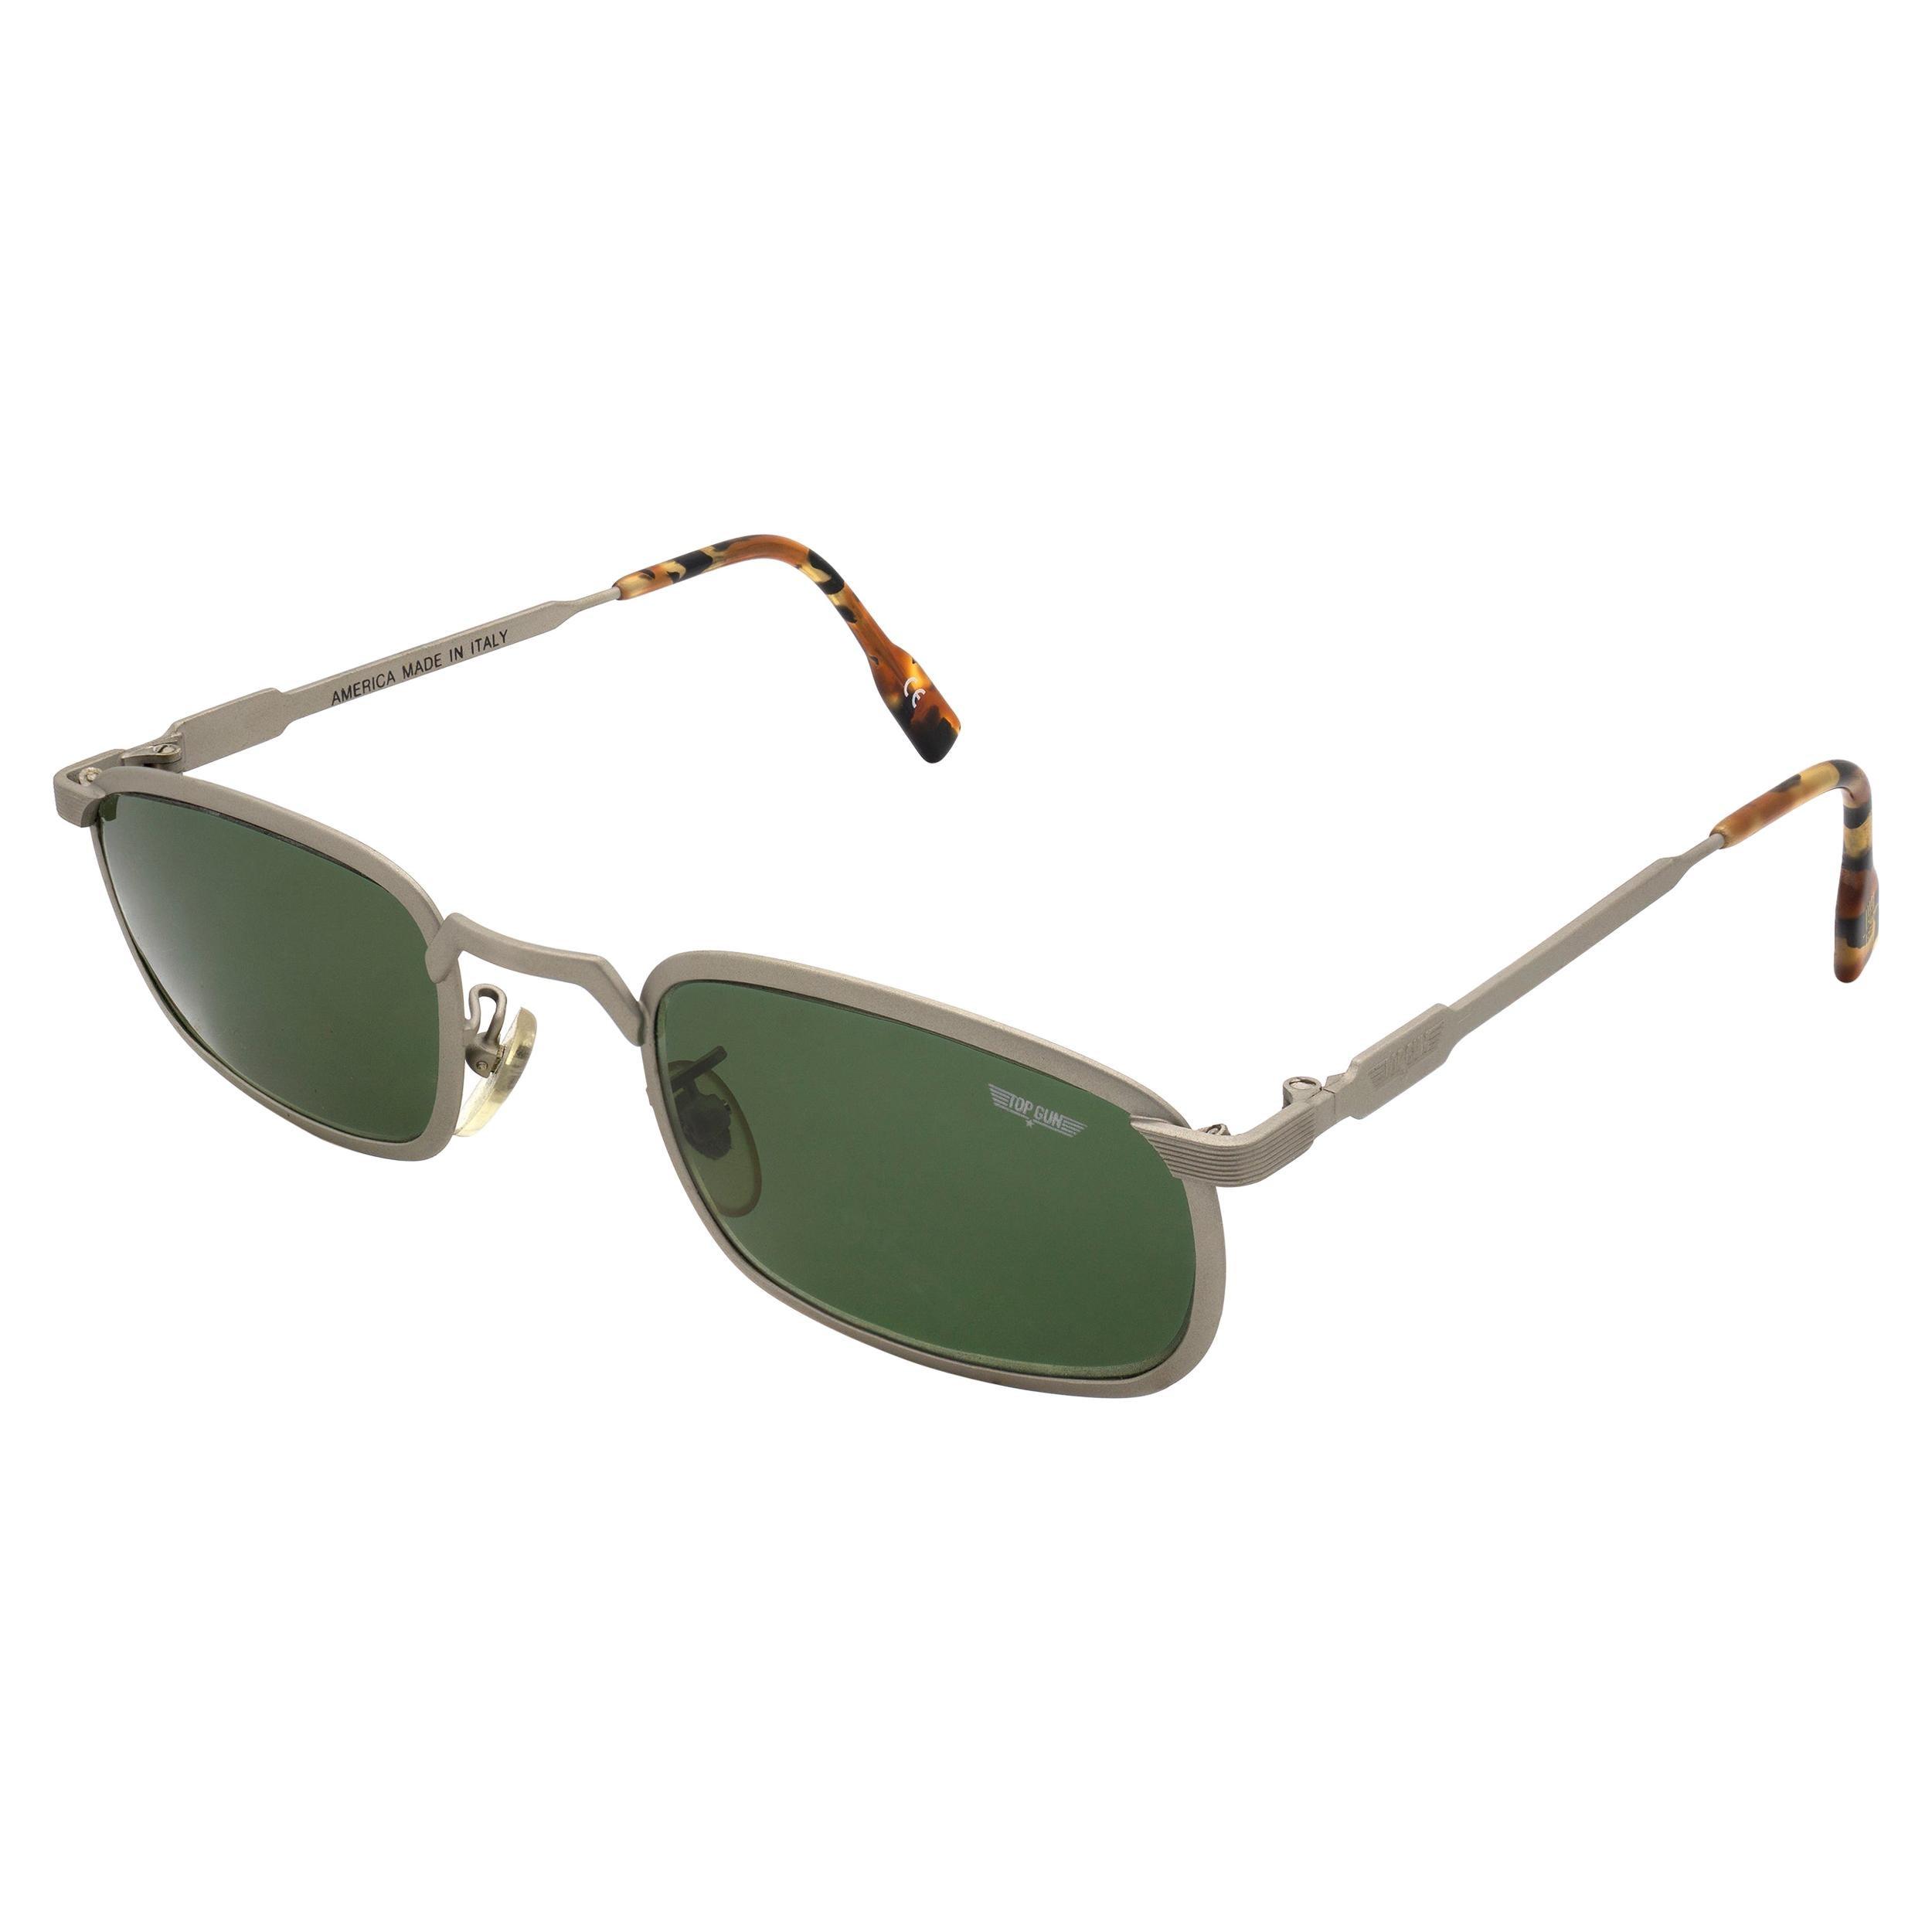 Top Gun® vintage sunglasses, Italy 90s